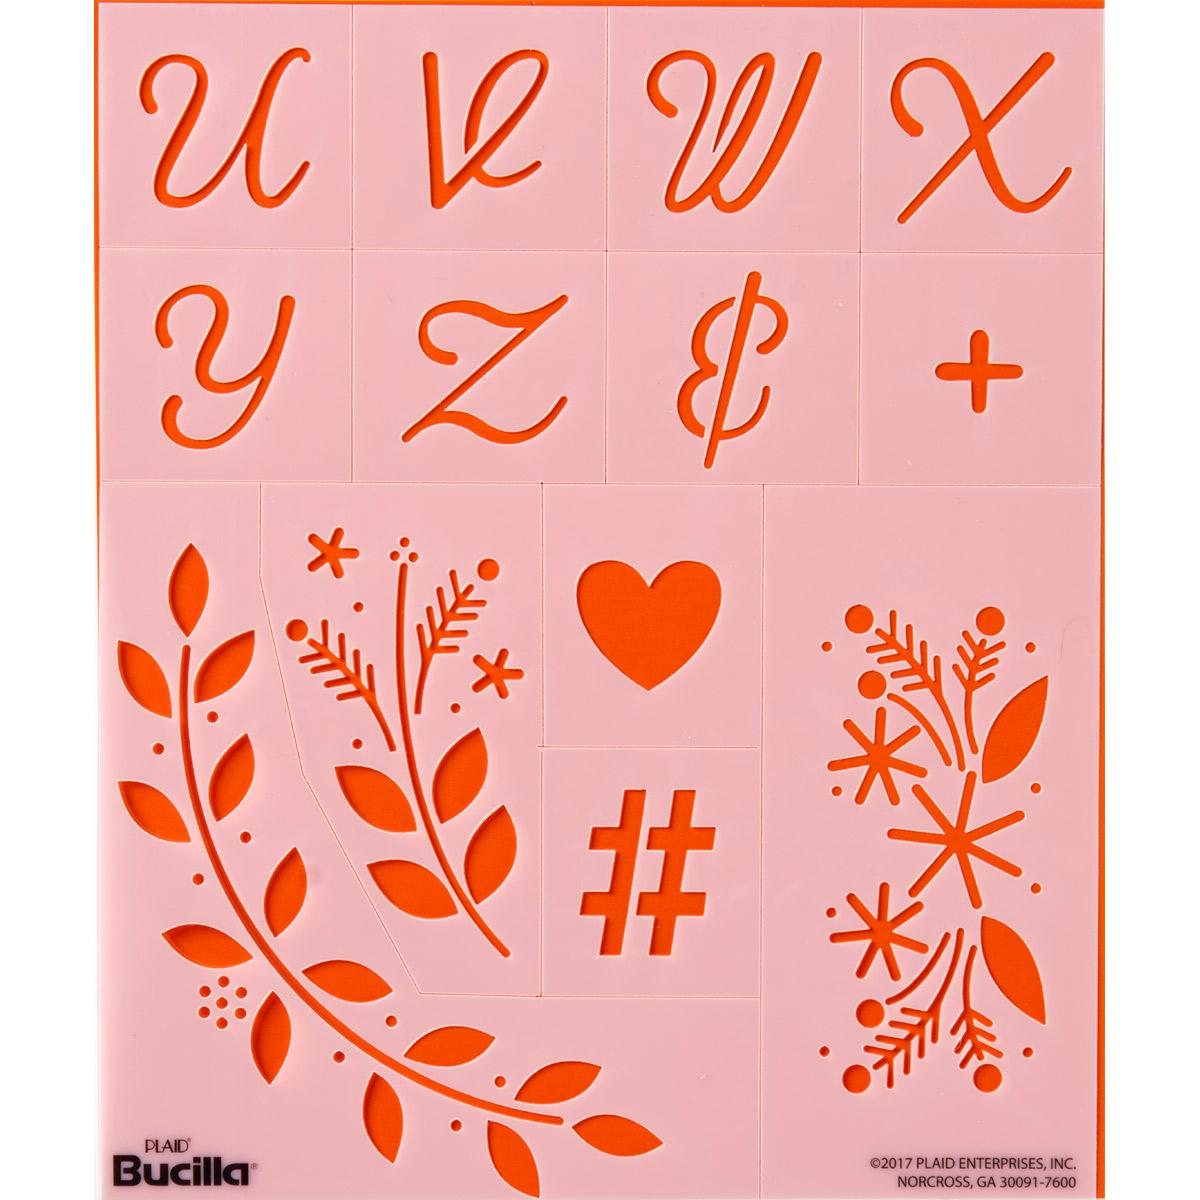 Bucilla ® Lettering and Monogramming Template Kit - Alphabet Script - 49066E